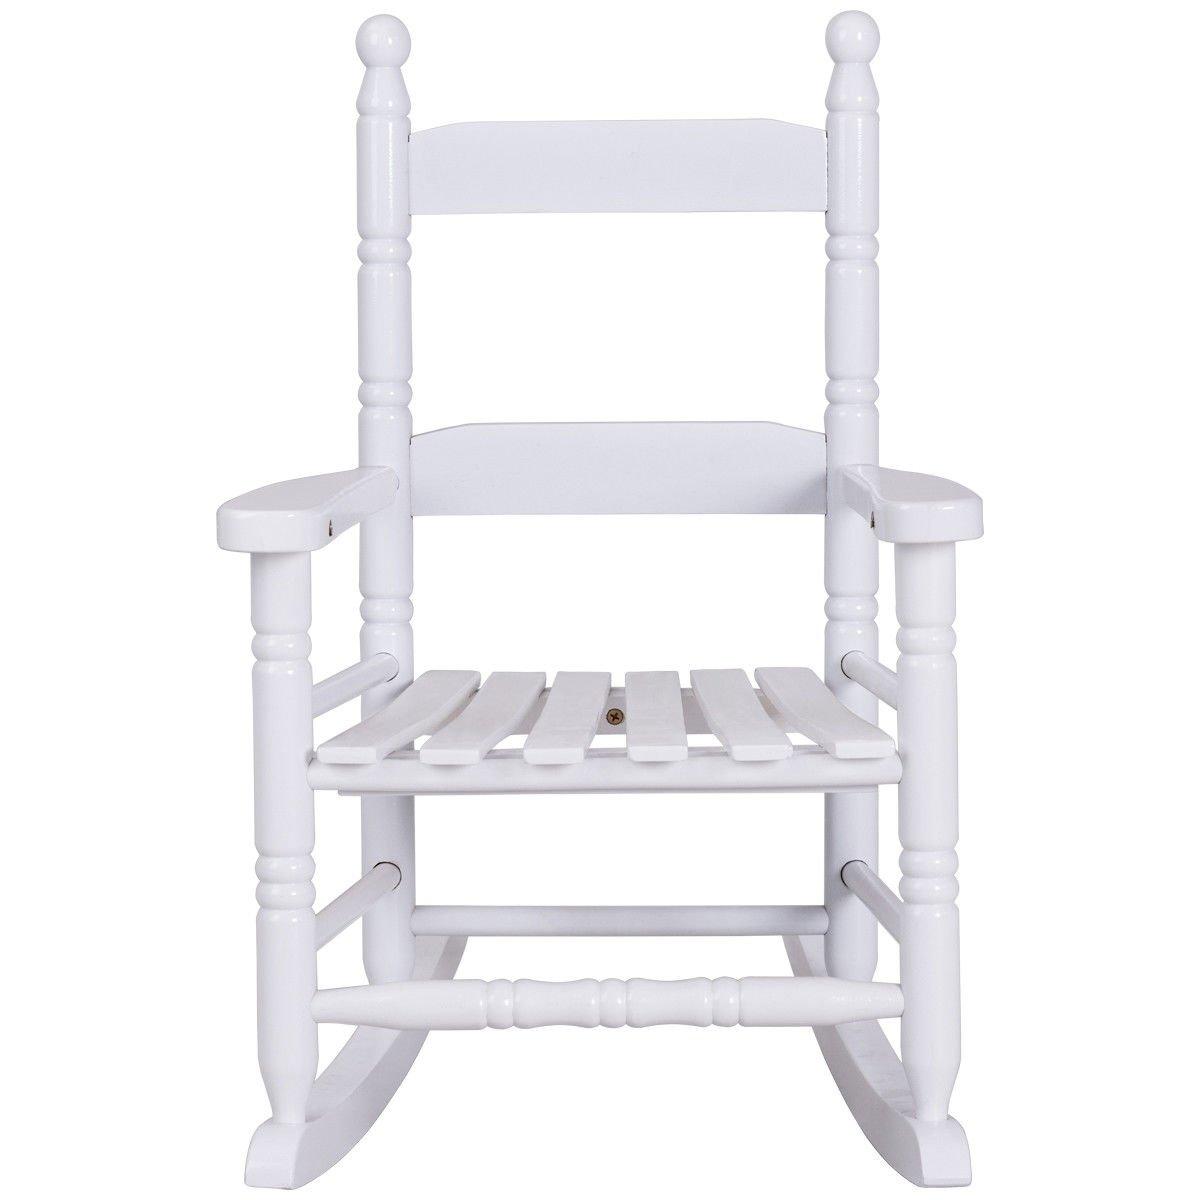 Classic White Wooden Children Kids Rocking Chair Slat Back Furniture Bedroom